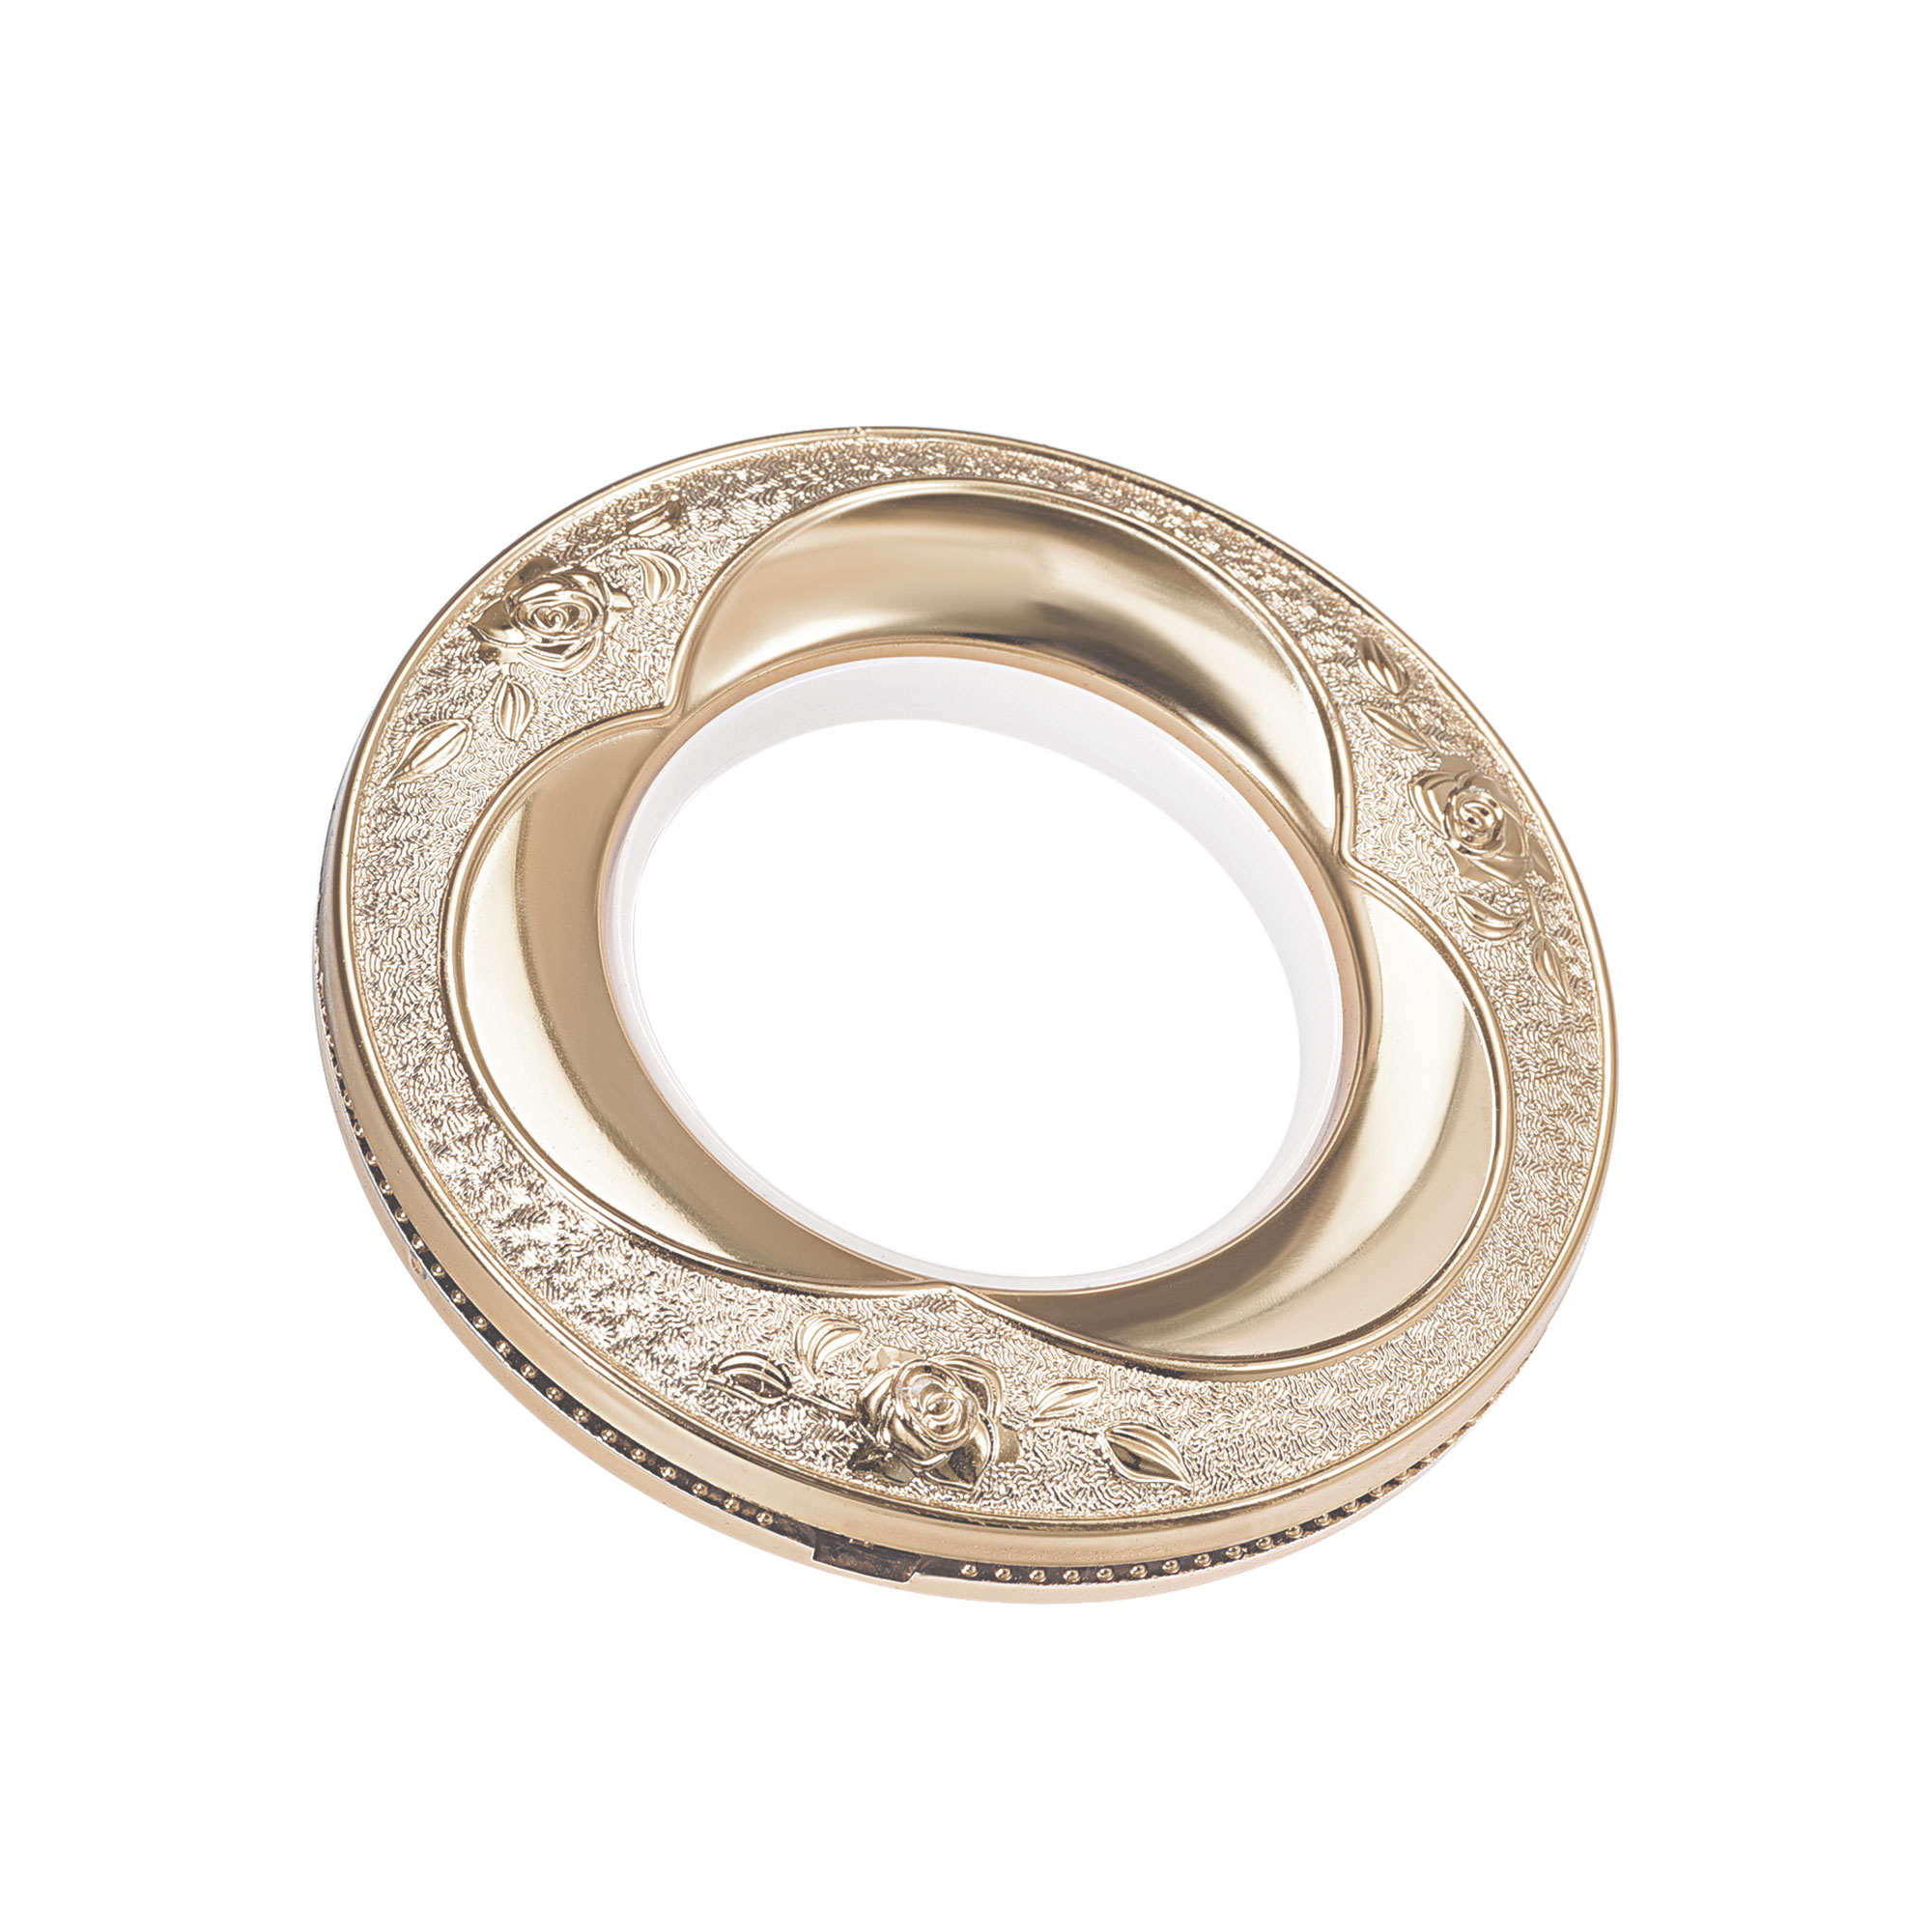 42mm Curtain Grommets Eyelets Roman Rings Home Decor Rose Gold 32pcs